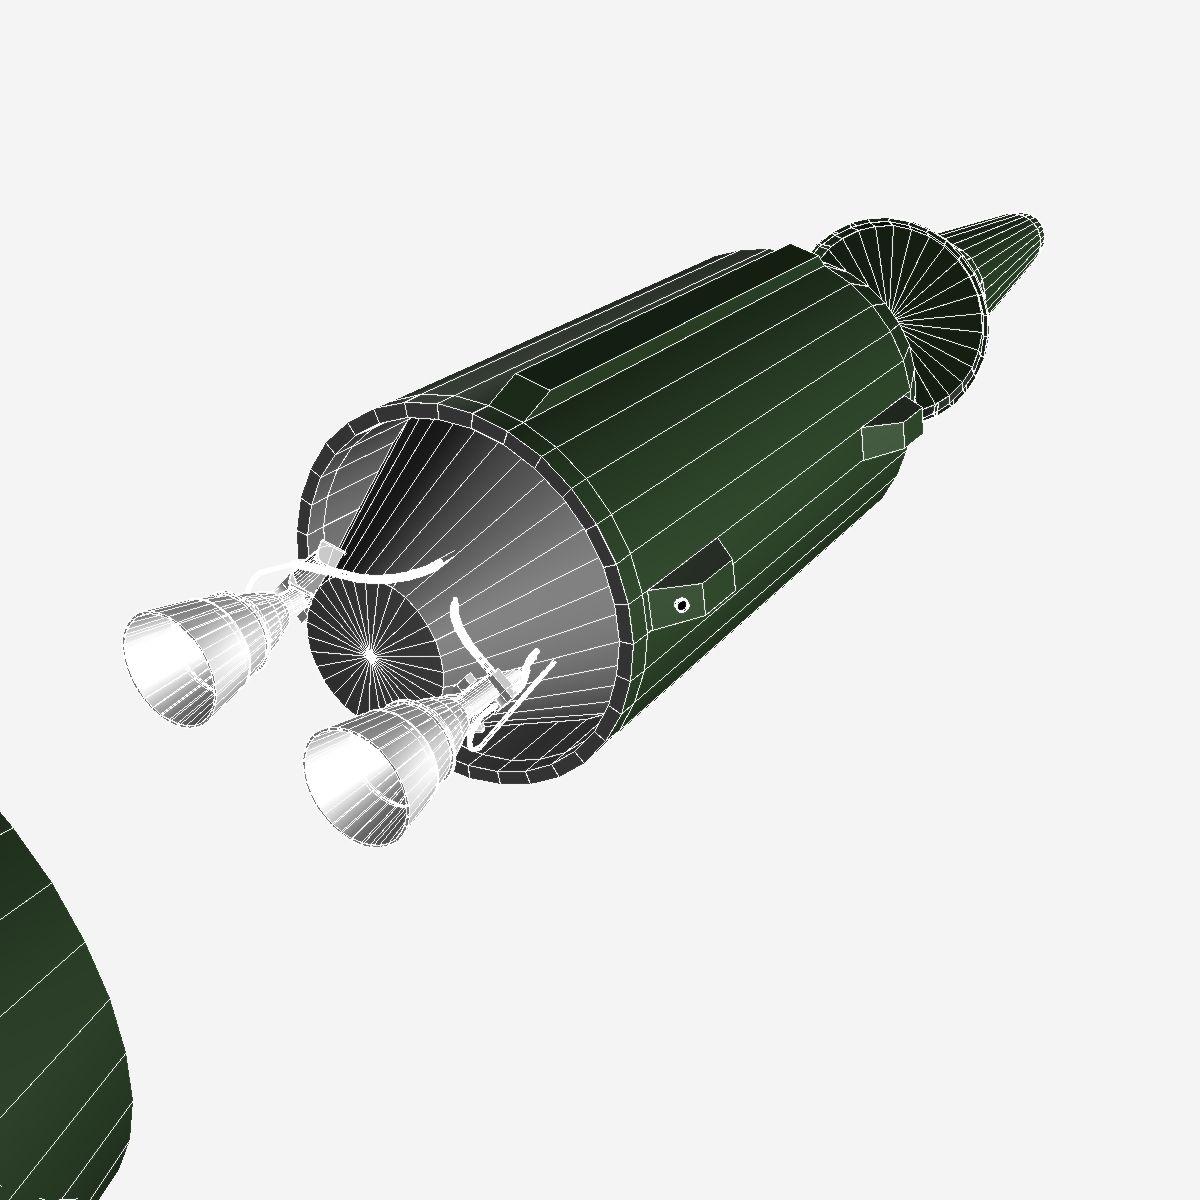 dprk kn-08 no dong-c пуужин 3d загвар 3ds dxf cob x obj 151631